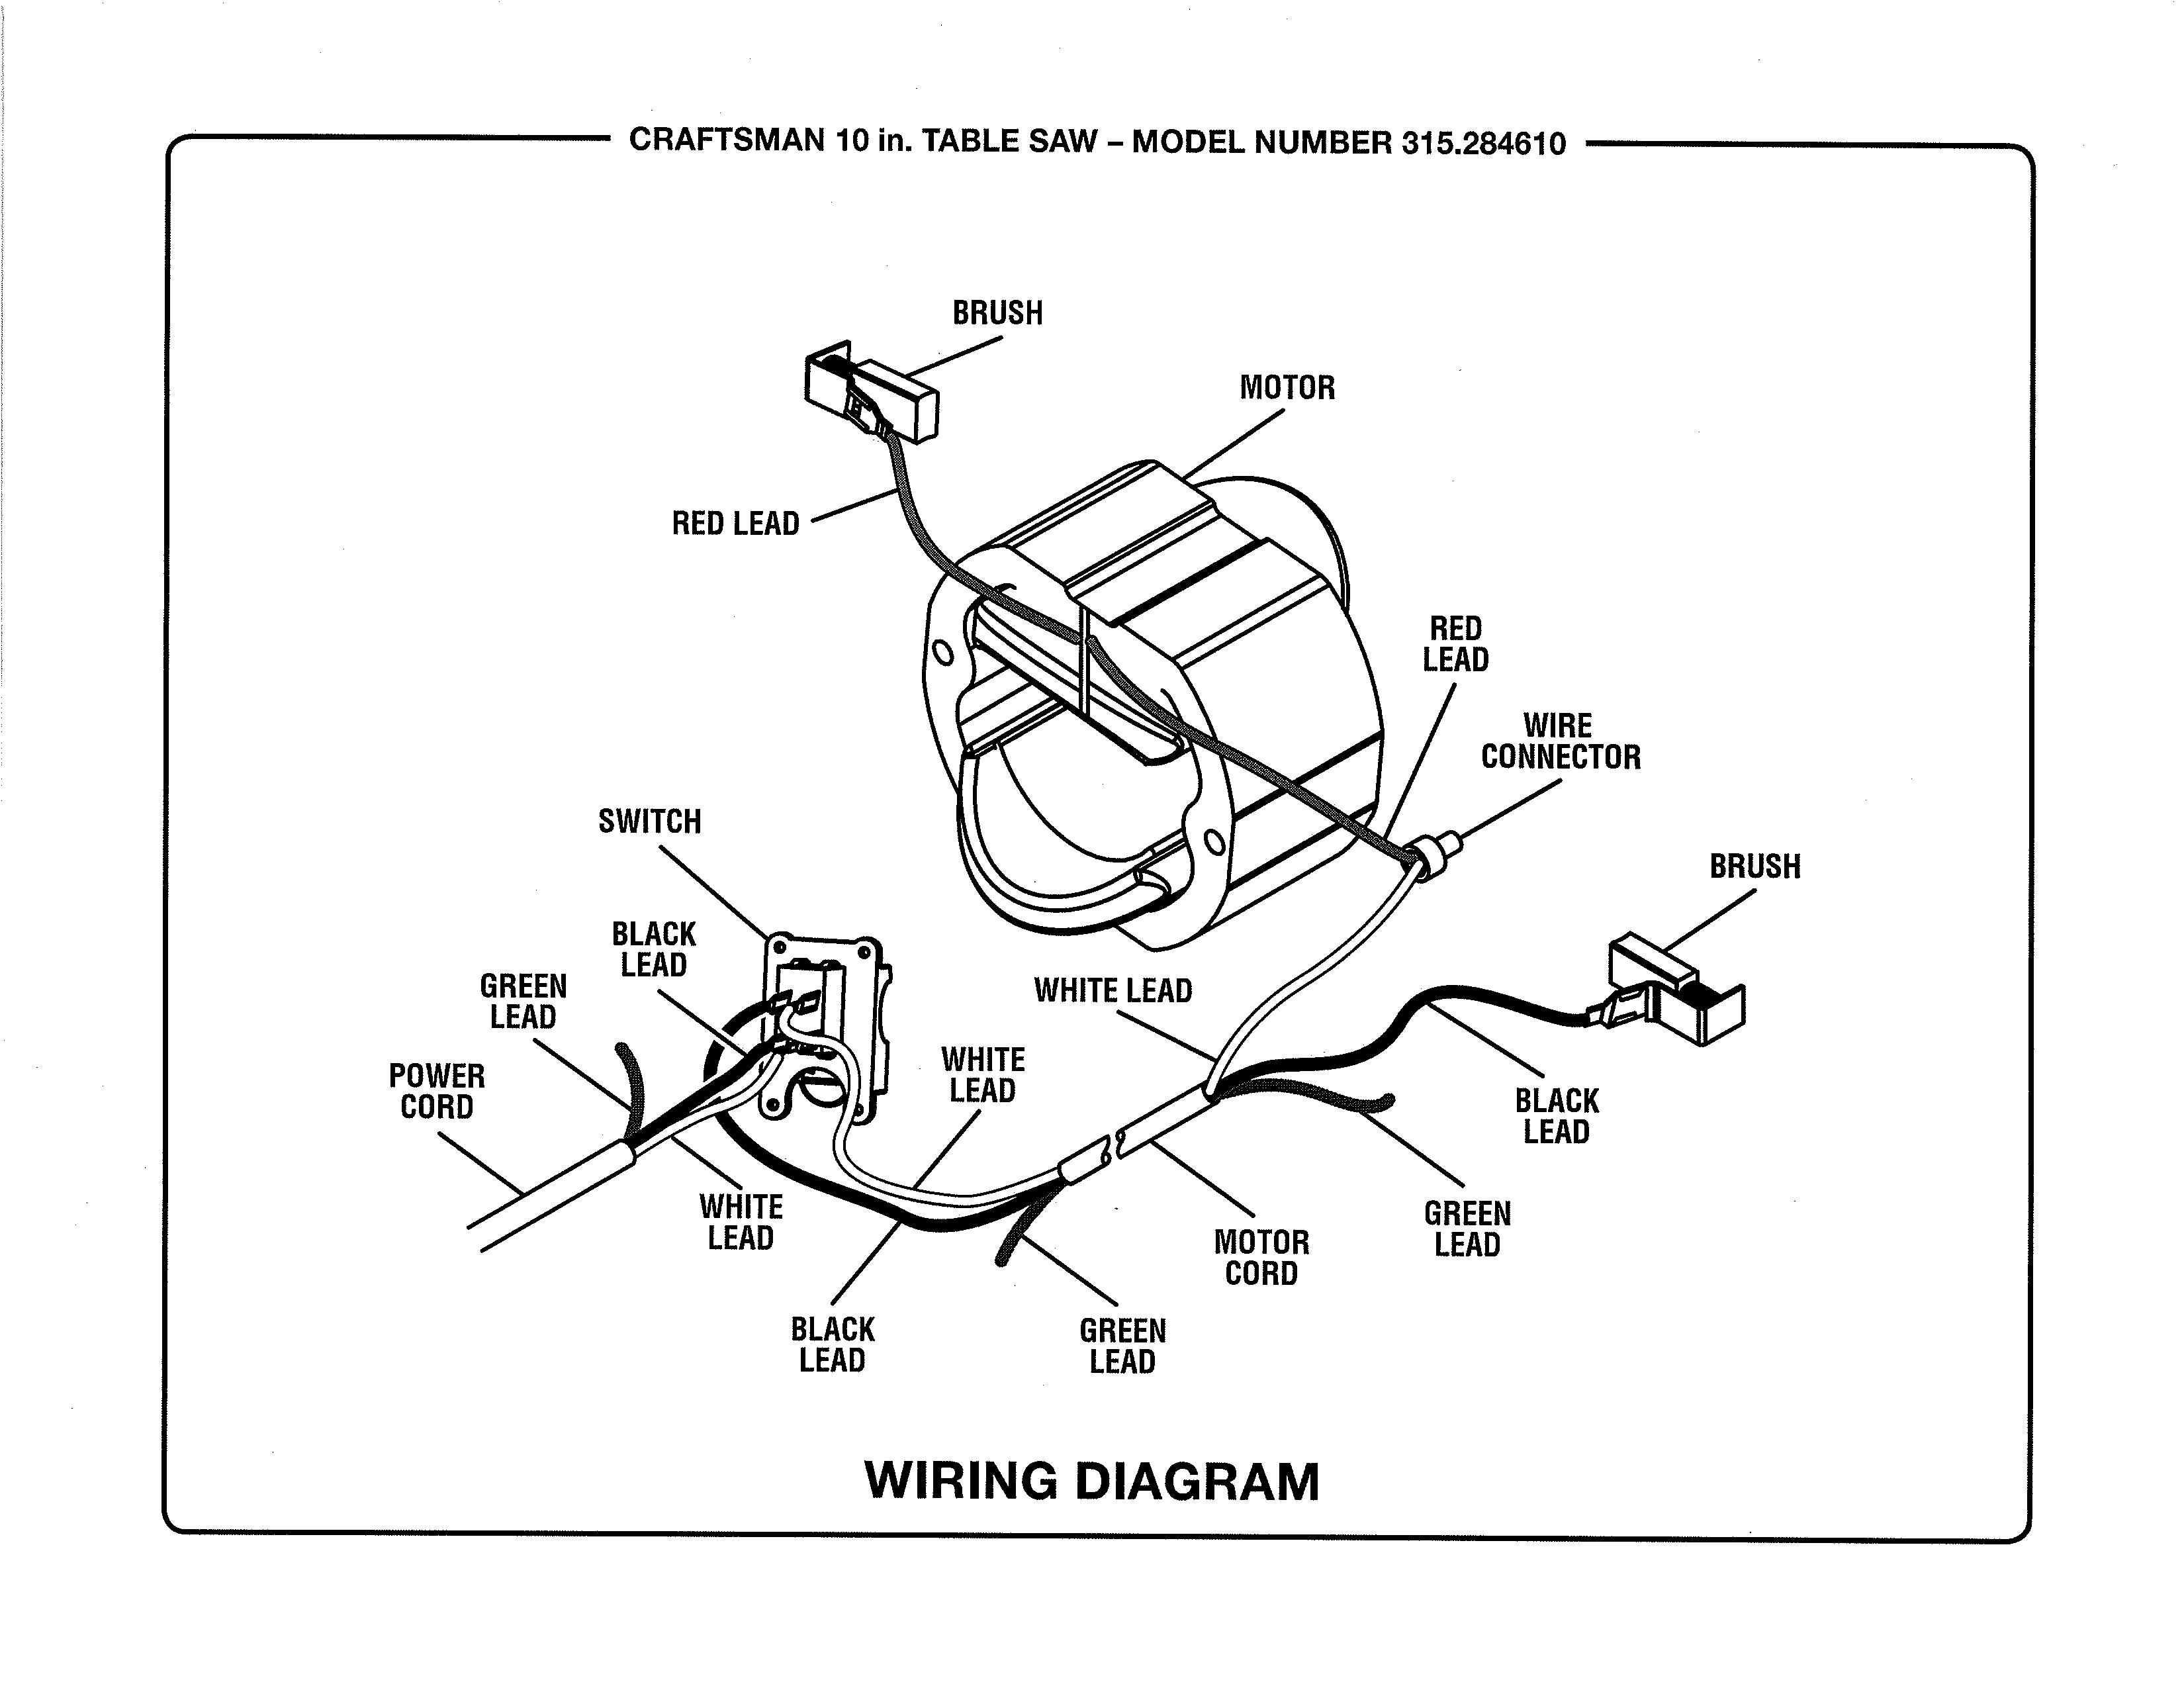 table saw motor wire diagram schematic diagram Wye-Delta Motor Connection Diagram makita table saw switch wiring diagram wiring diagram delta wye motor diagram makita miter saw